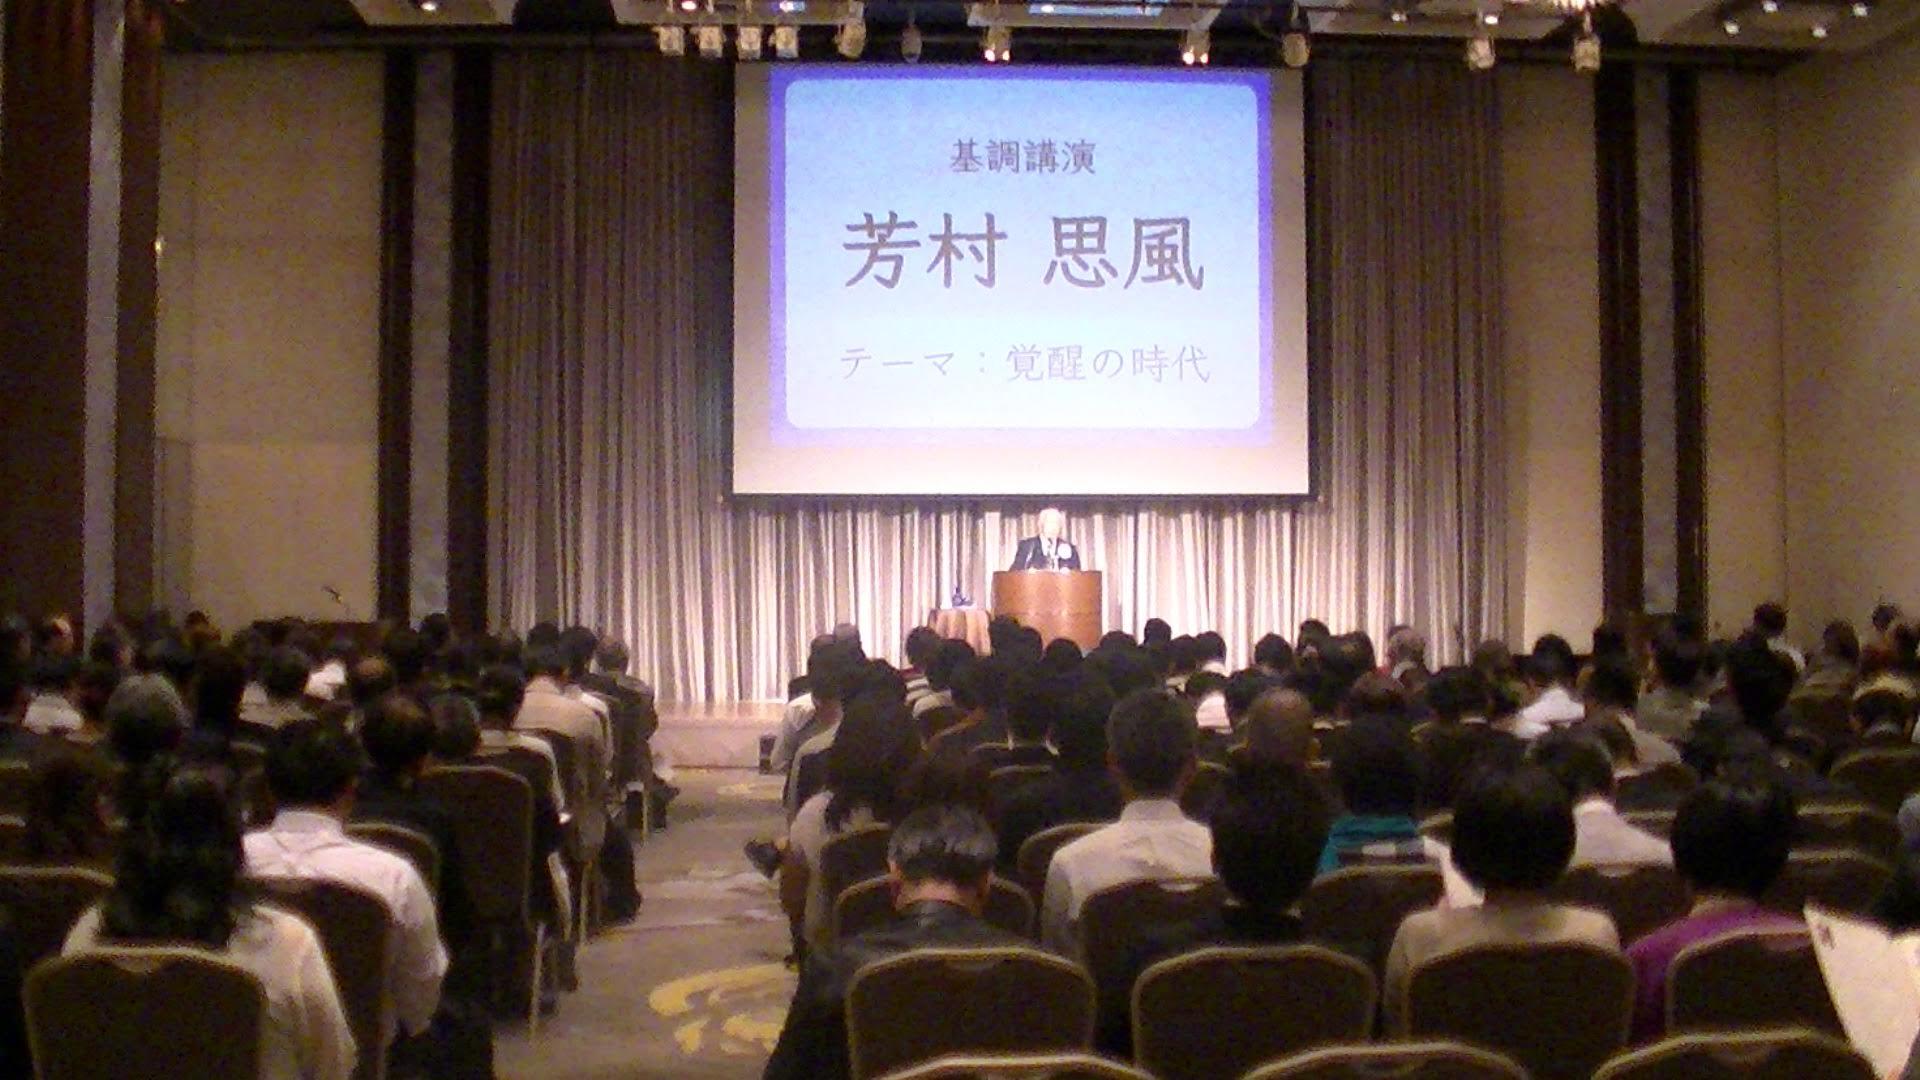 PIC 1652 1 - 思風会全国大会in広島